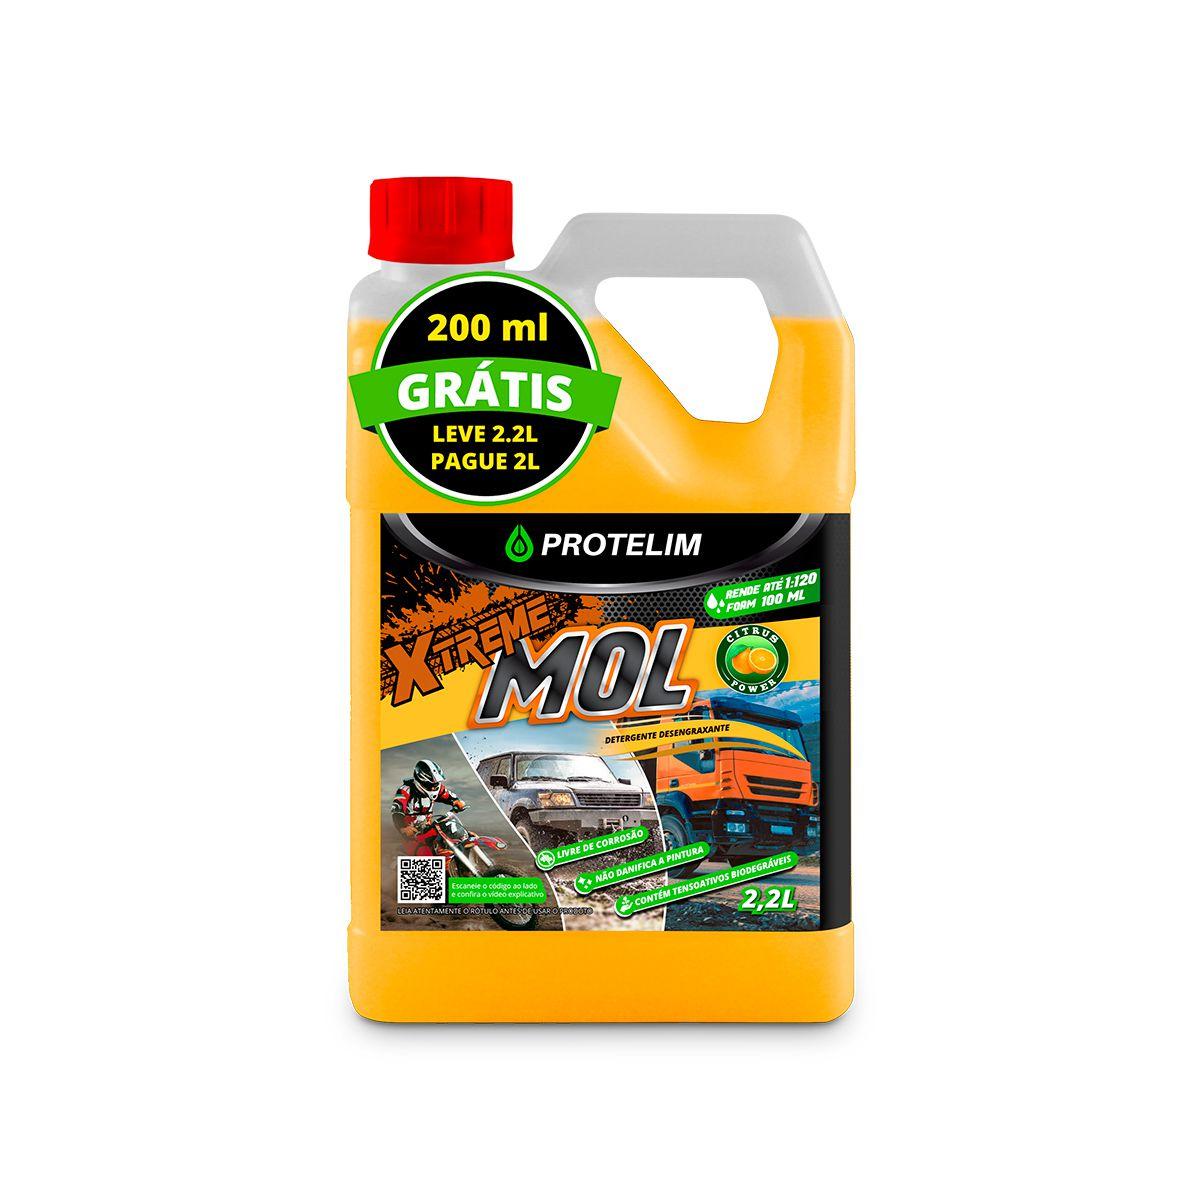 Detergente Desengraxante Xtreme Mol 2.2L - Protelim